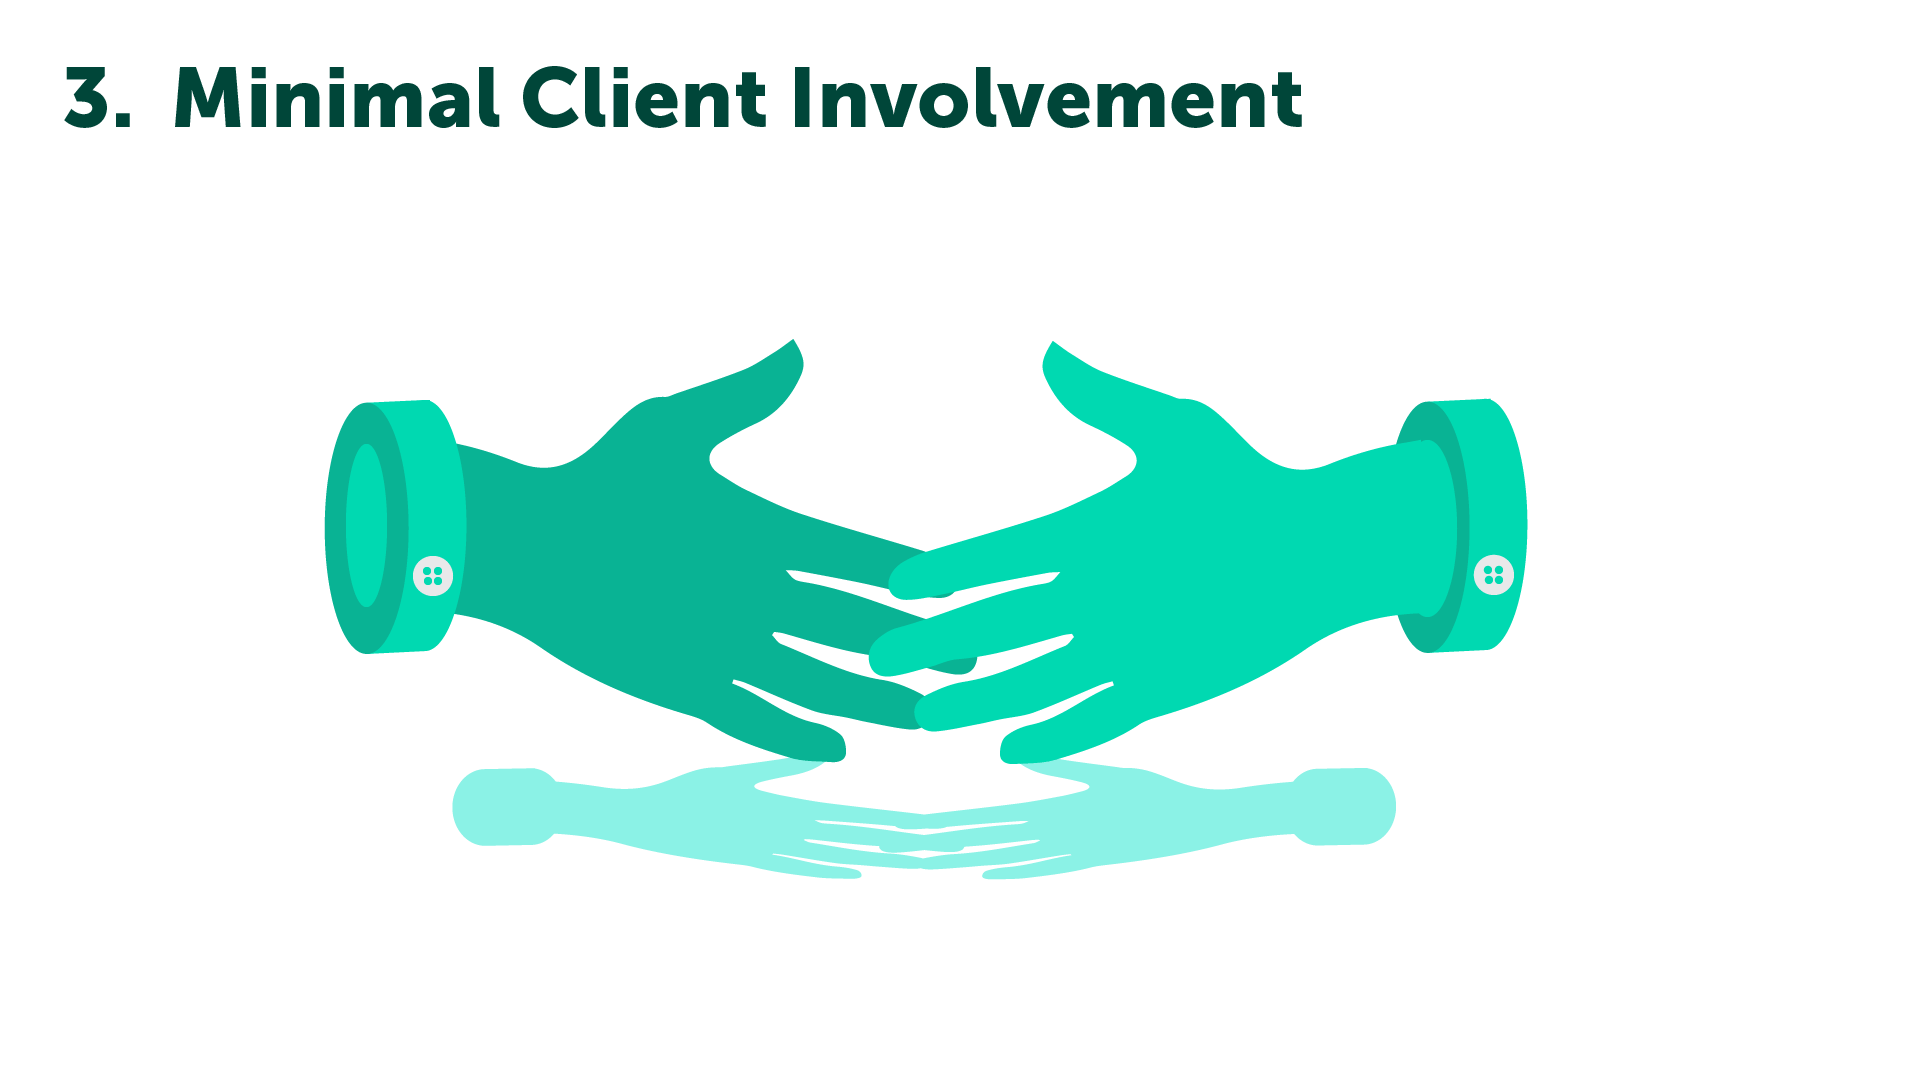 Minimal Client Involvement